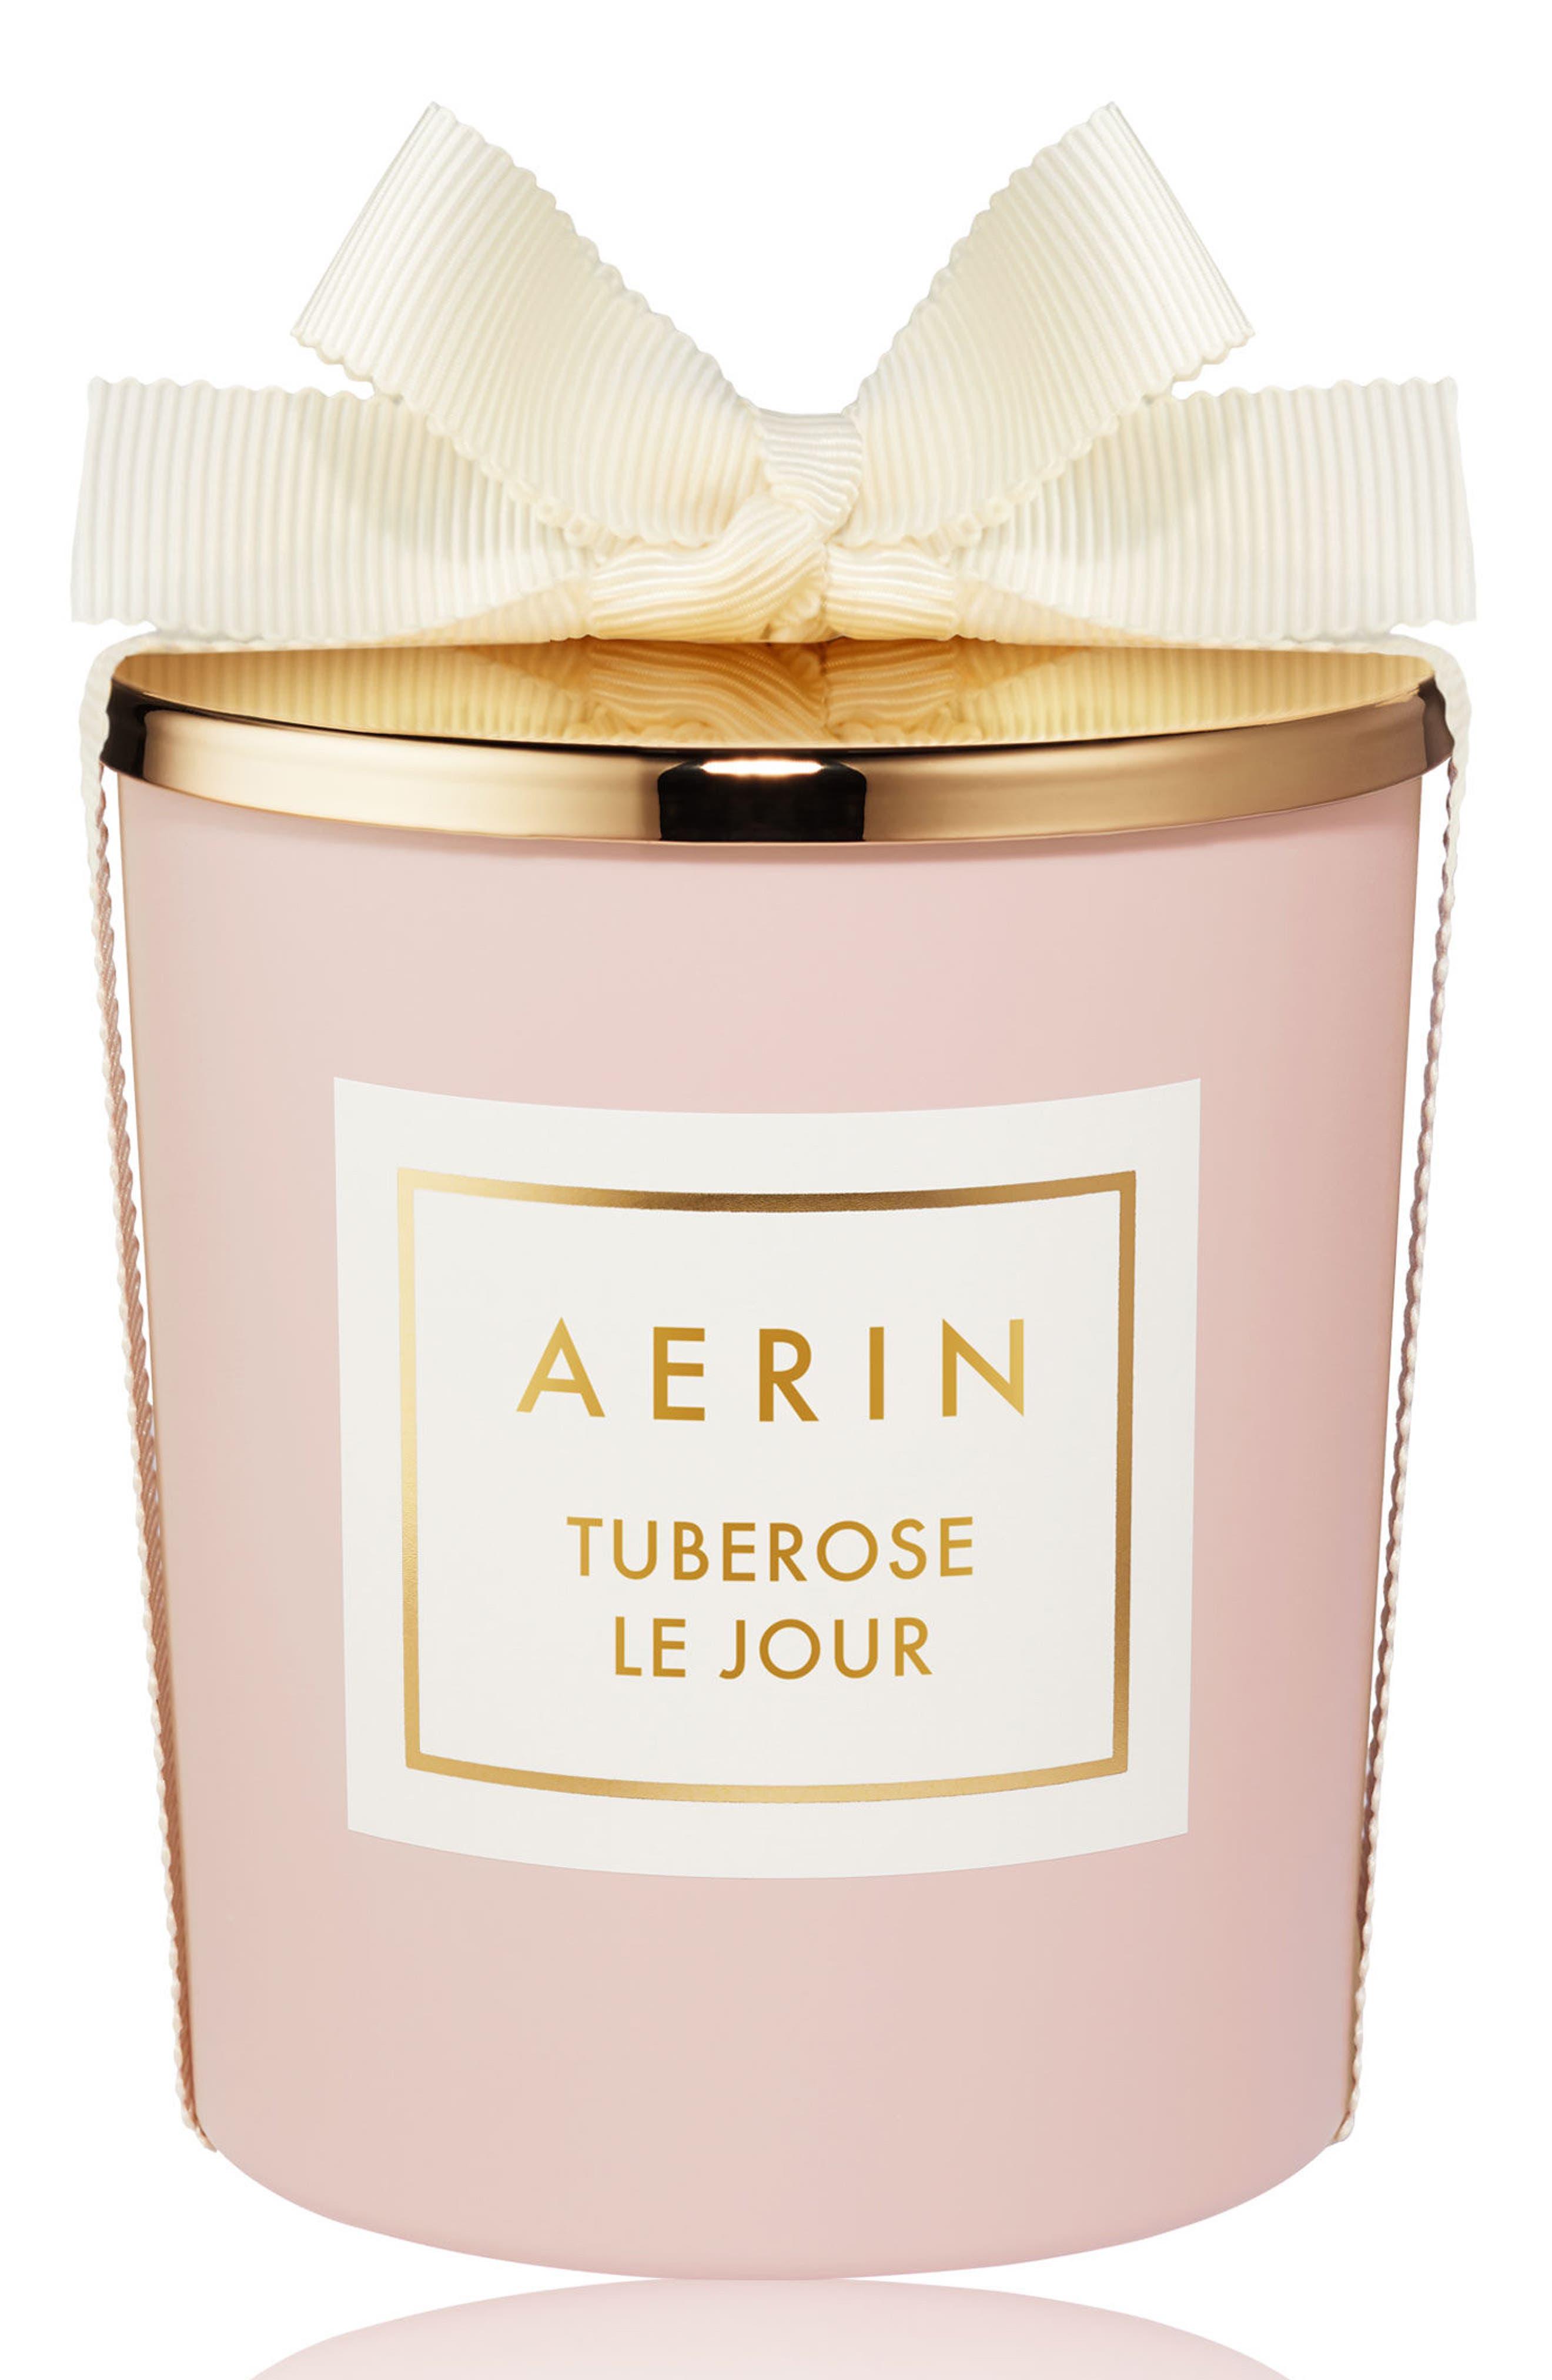 AERIN Beauty Tuberose Le Jour Candle,                             Main thumbnail 1, color,                             000